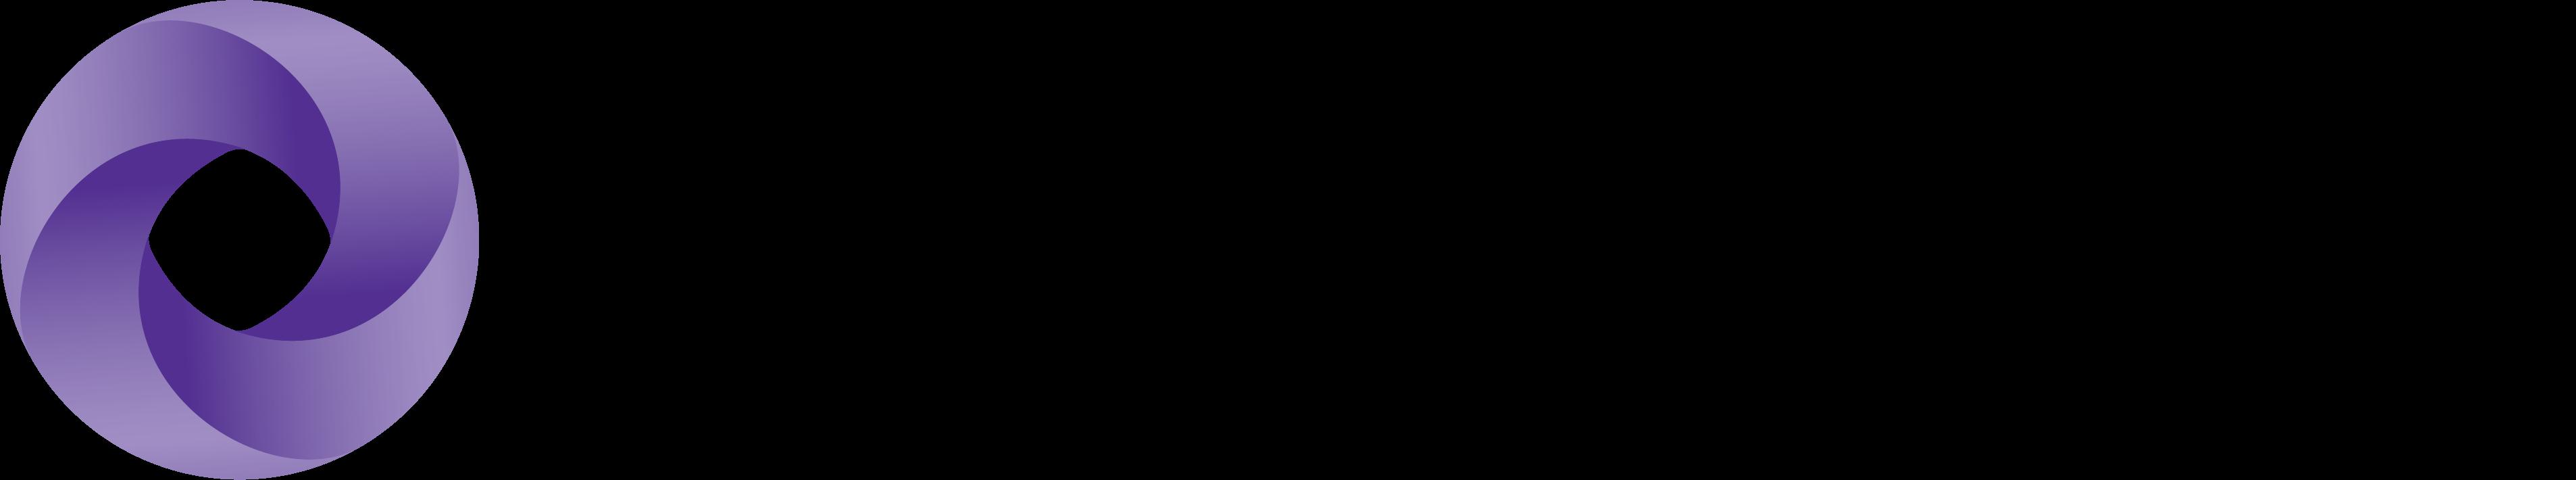 grant-thornton-logo-customer-case